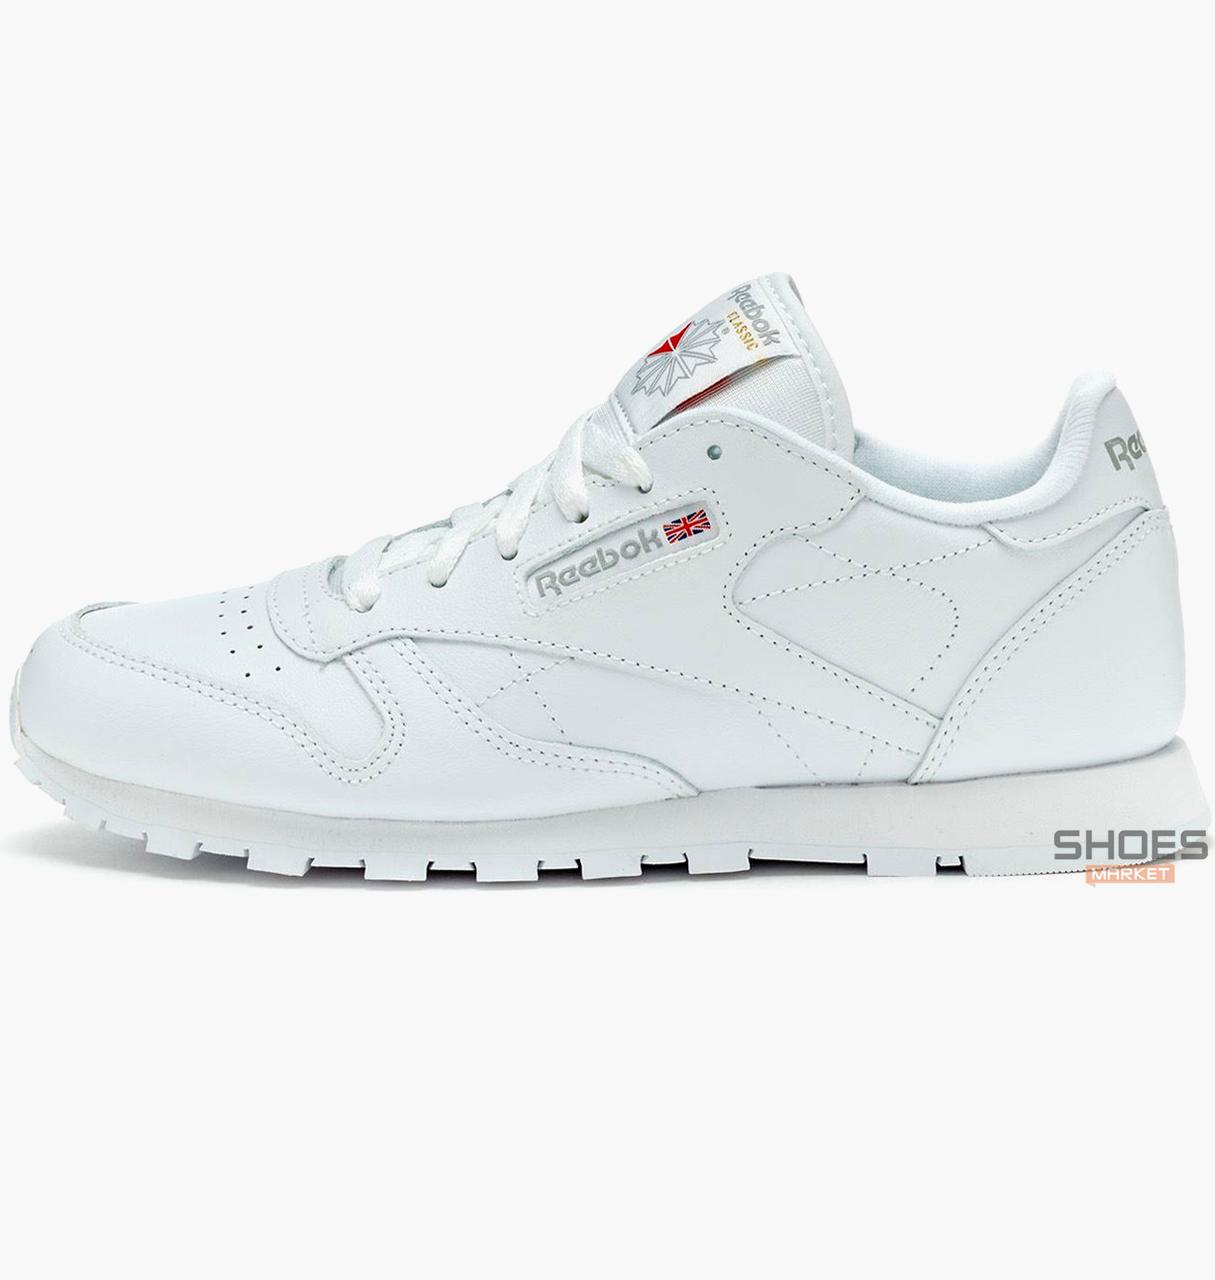 Женские кроссовки Reebok Classic Leather White 50151, оригинал